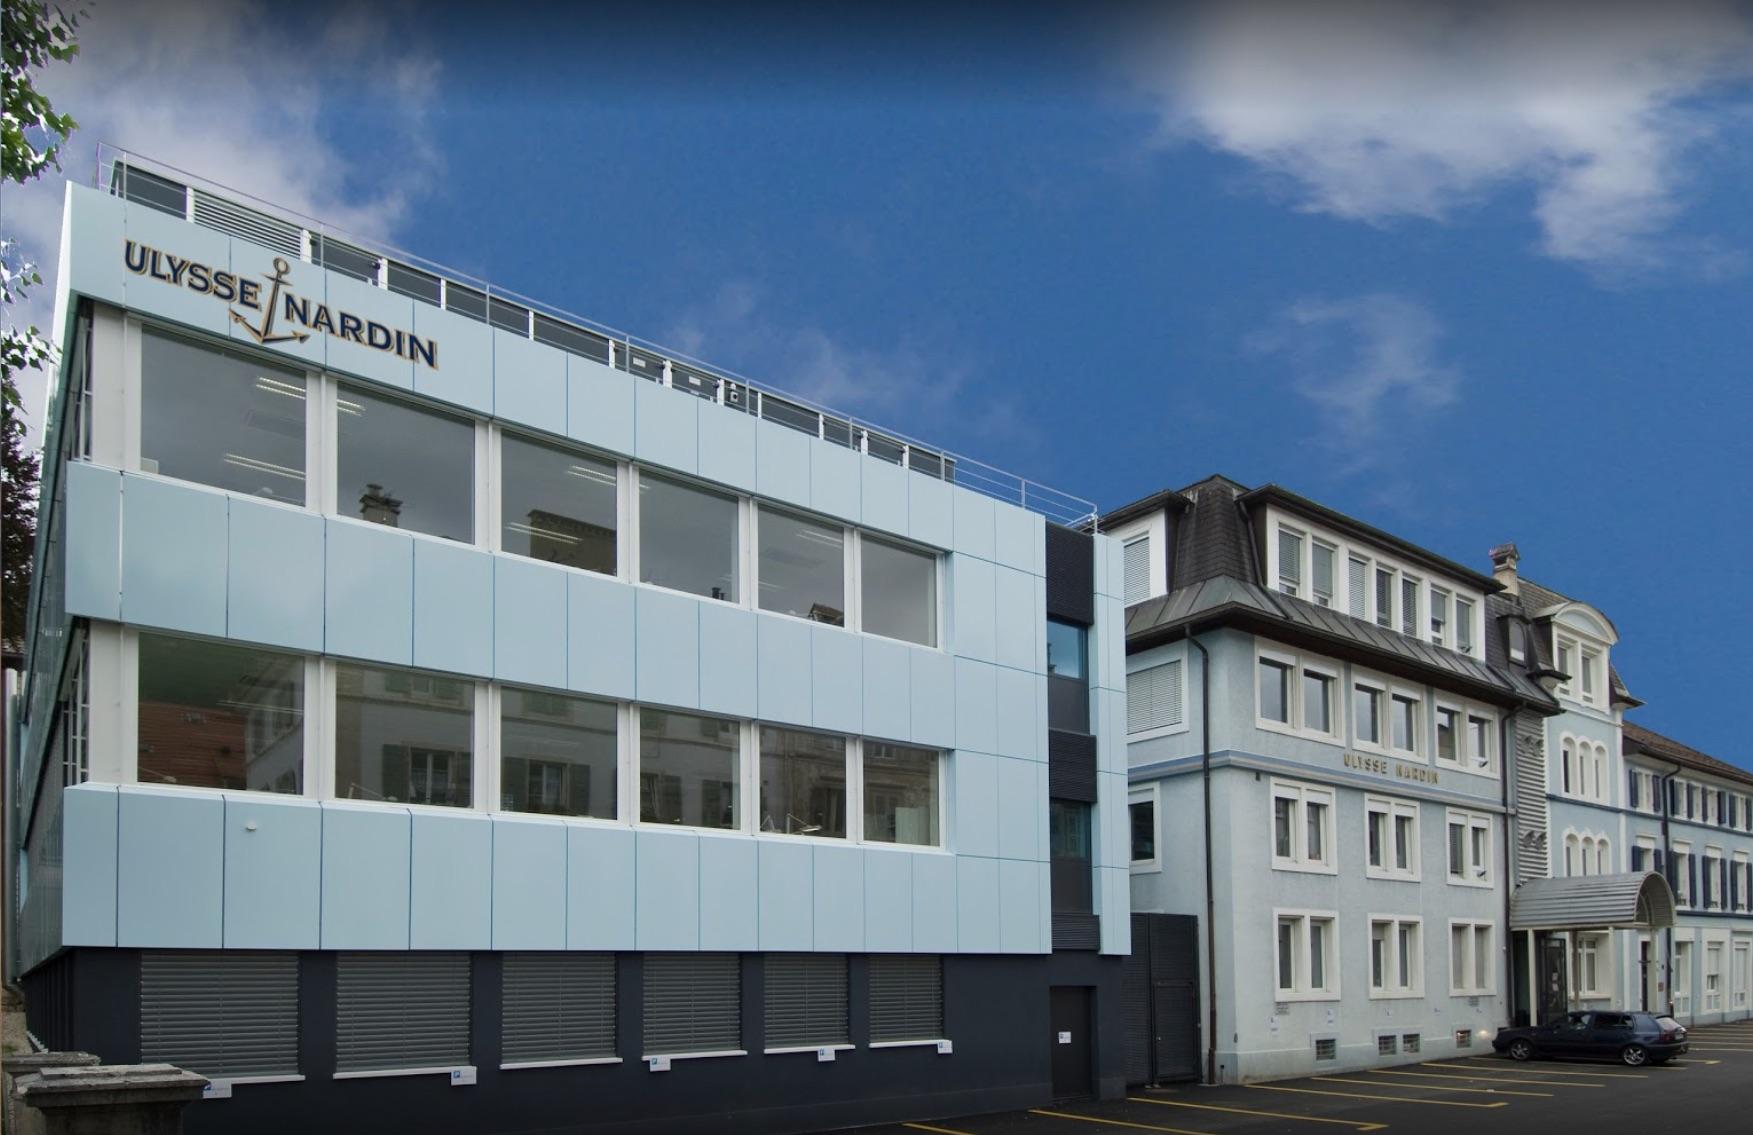 Sede de Ulysse Nardin en Le Locle, Suiza